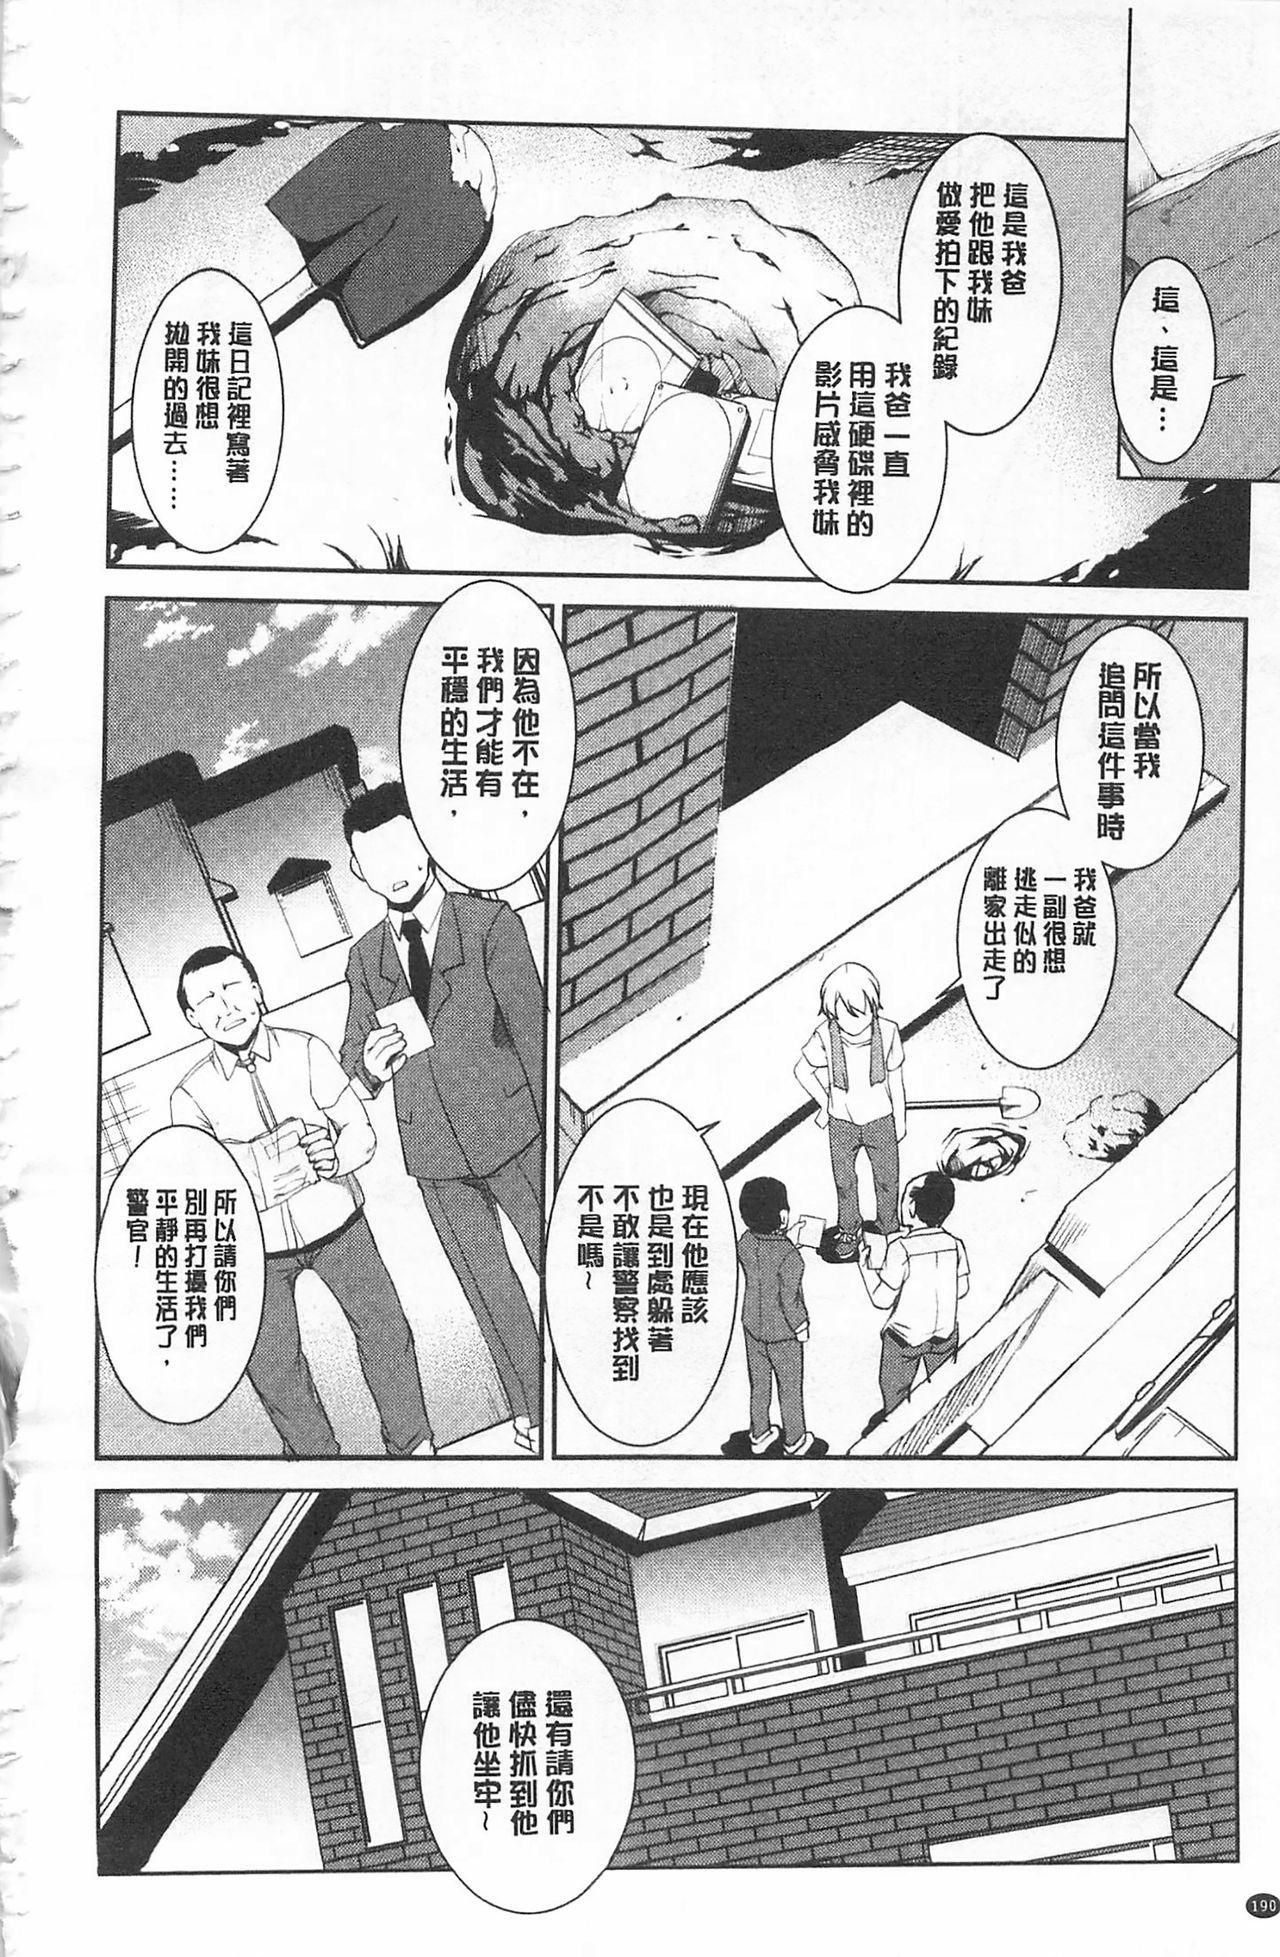 [Amano Kazumi] Seida Inyou -Seijo no Katachi Shita Intou- | 聖墮陰陽 -聖女的容貌與淫蕩- [Chinese] 193